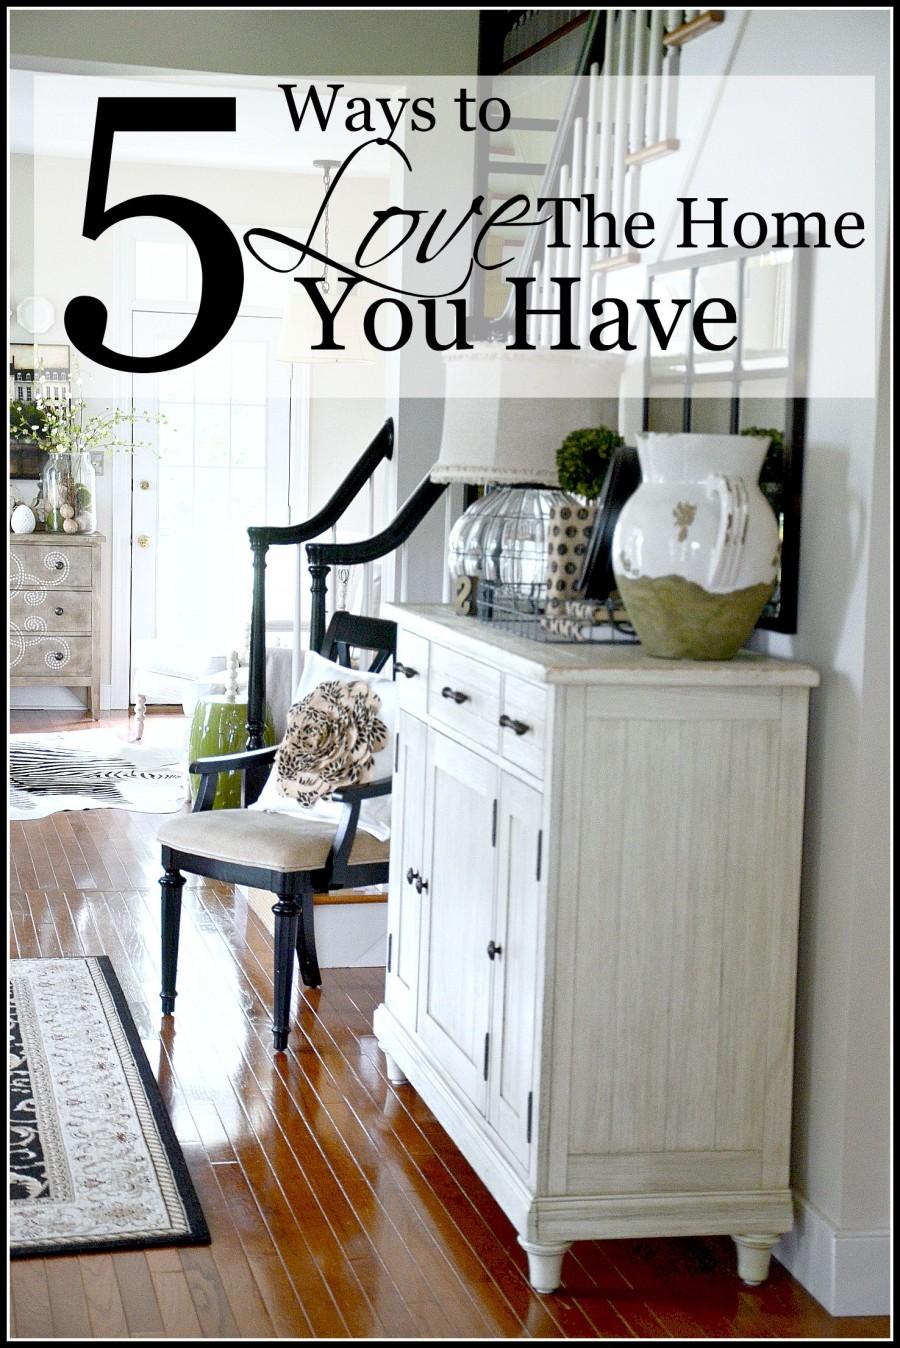 5 WAYS TO LOVE THE HOME YOU HAVE-stonegableblog.com